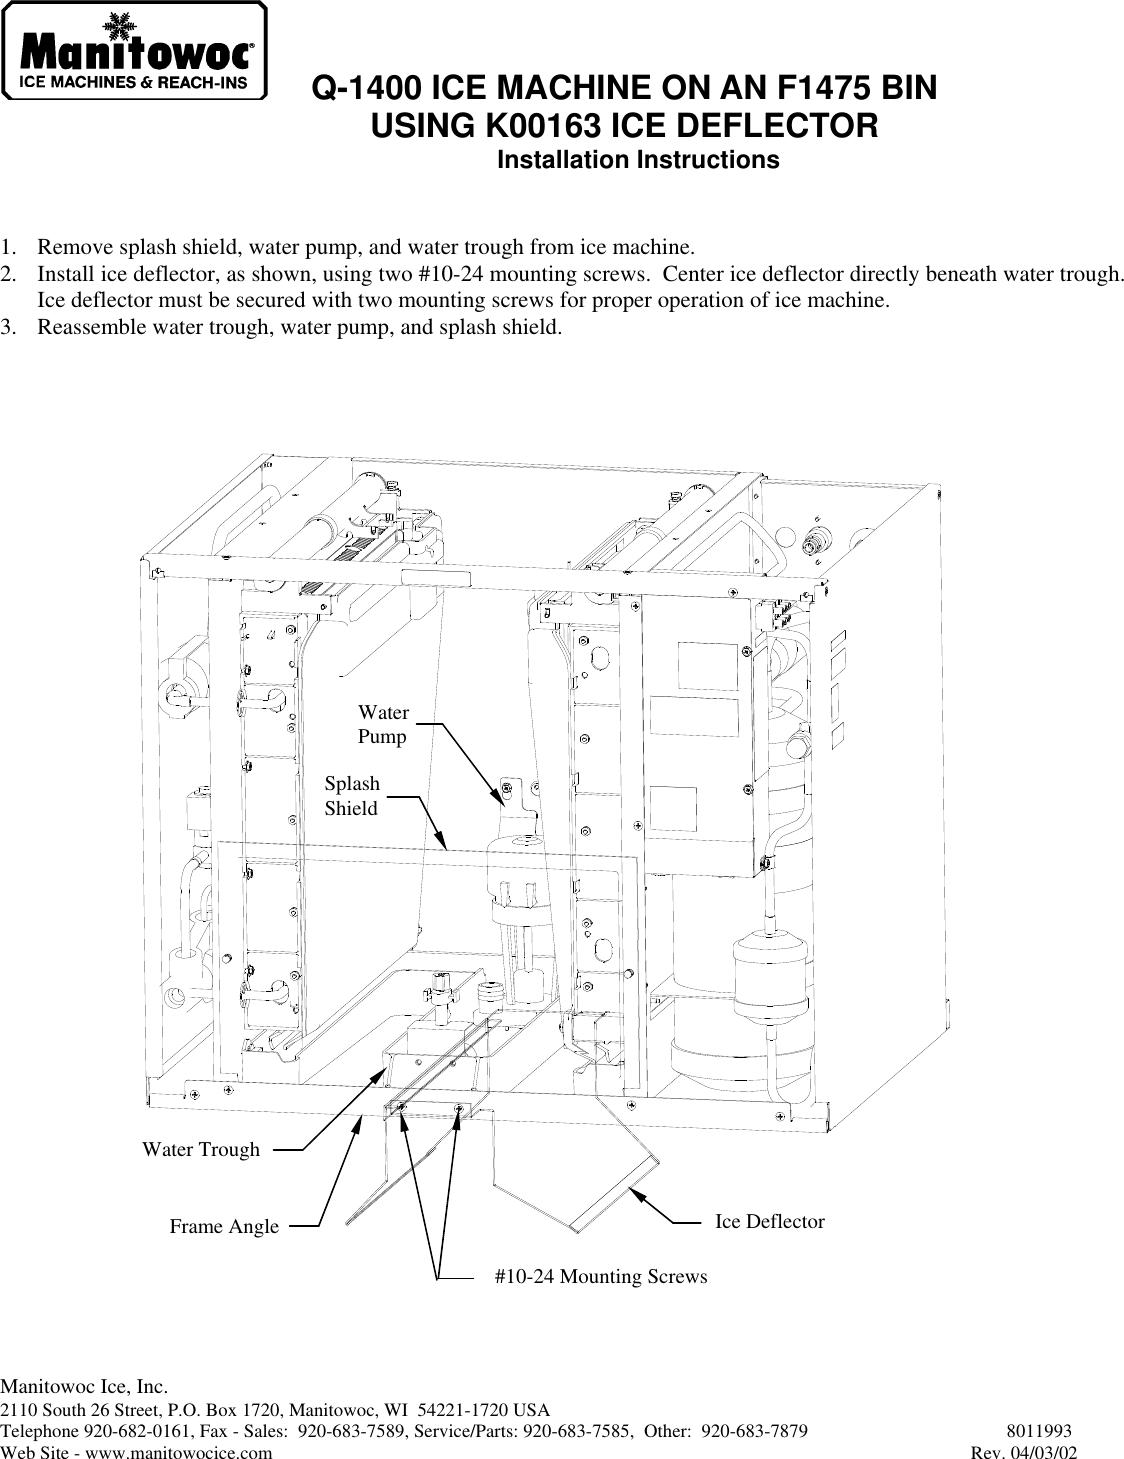 Manitowoc Ice Bulkhead Q 1400 Users Manual on